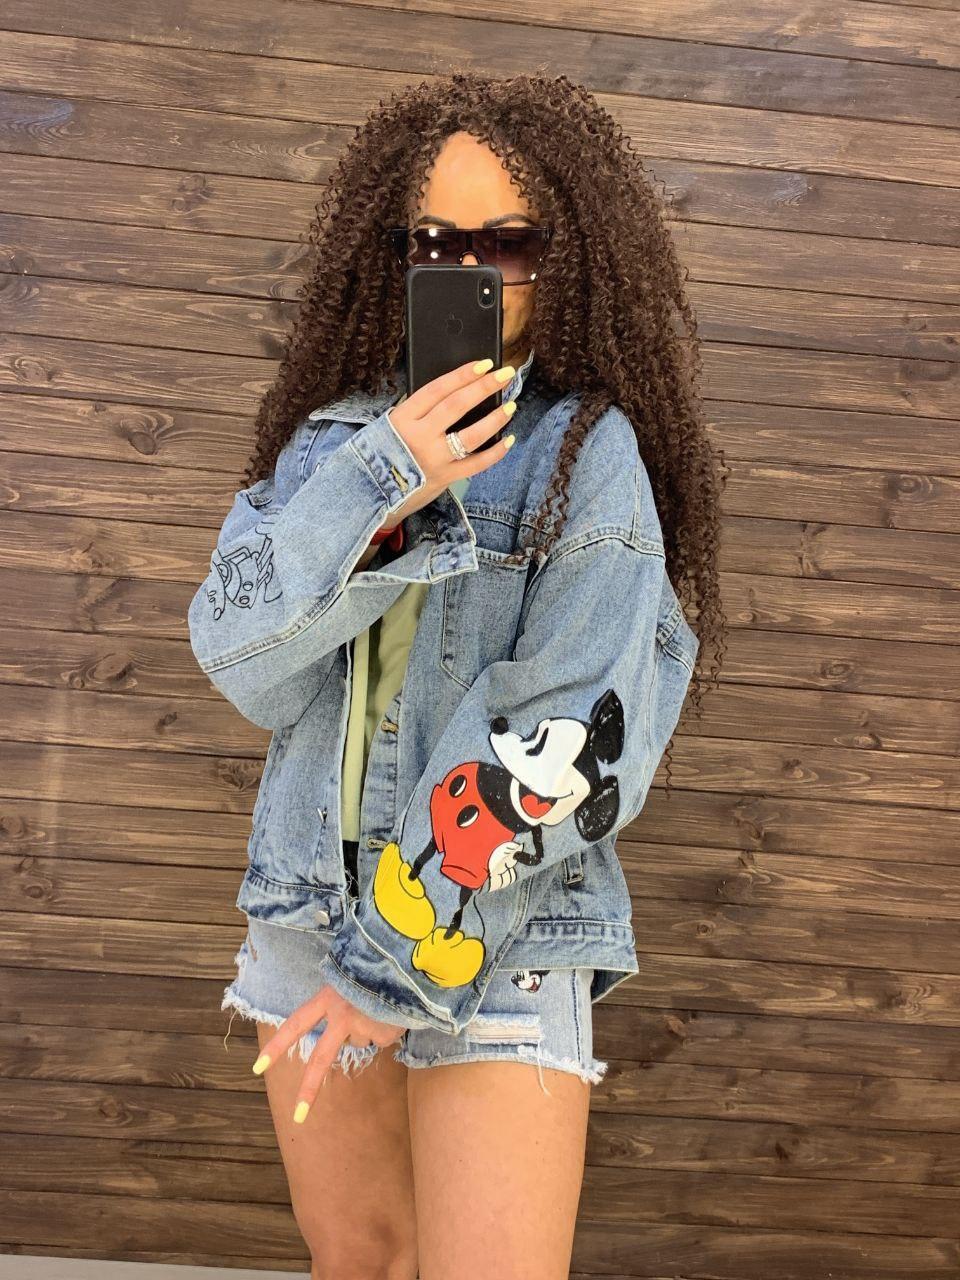 Женская джинсовая куртка оверсайз с рисунком Микки на спине 76ki299